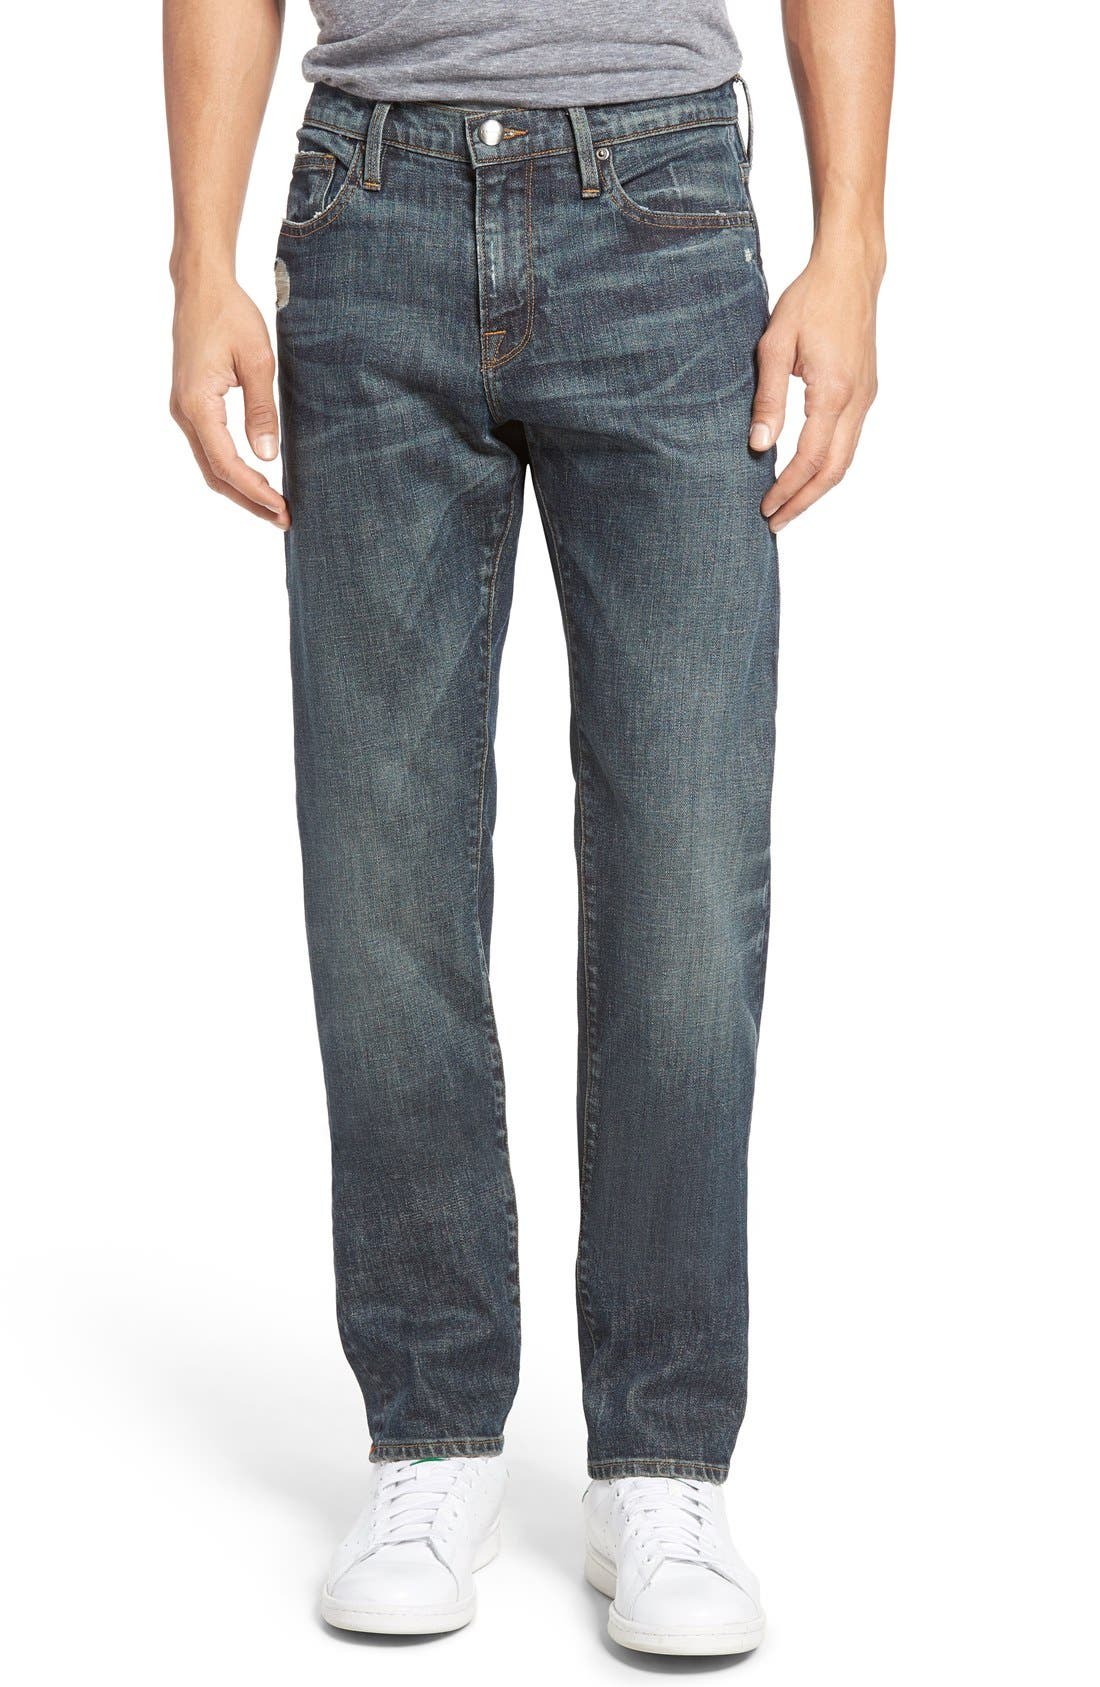 L'Homme Slim Fit Jeans,                         Main,                         color, Fort Davis